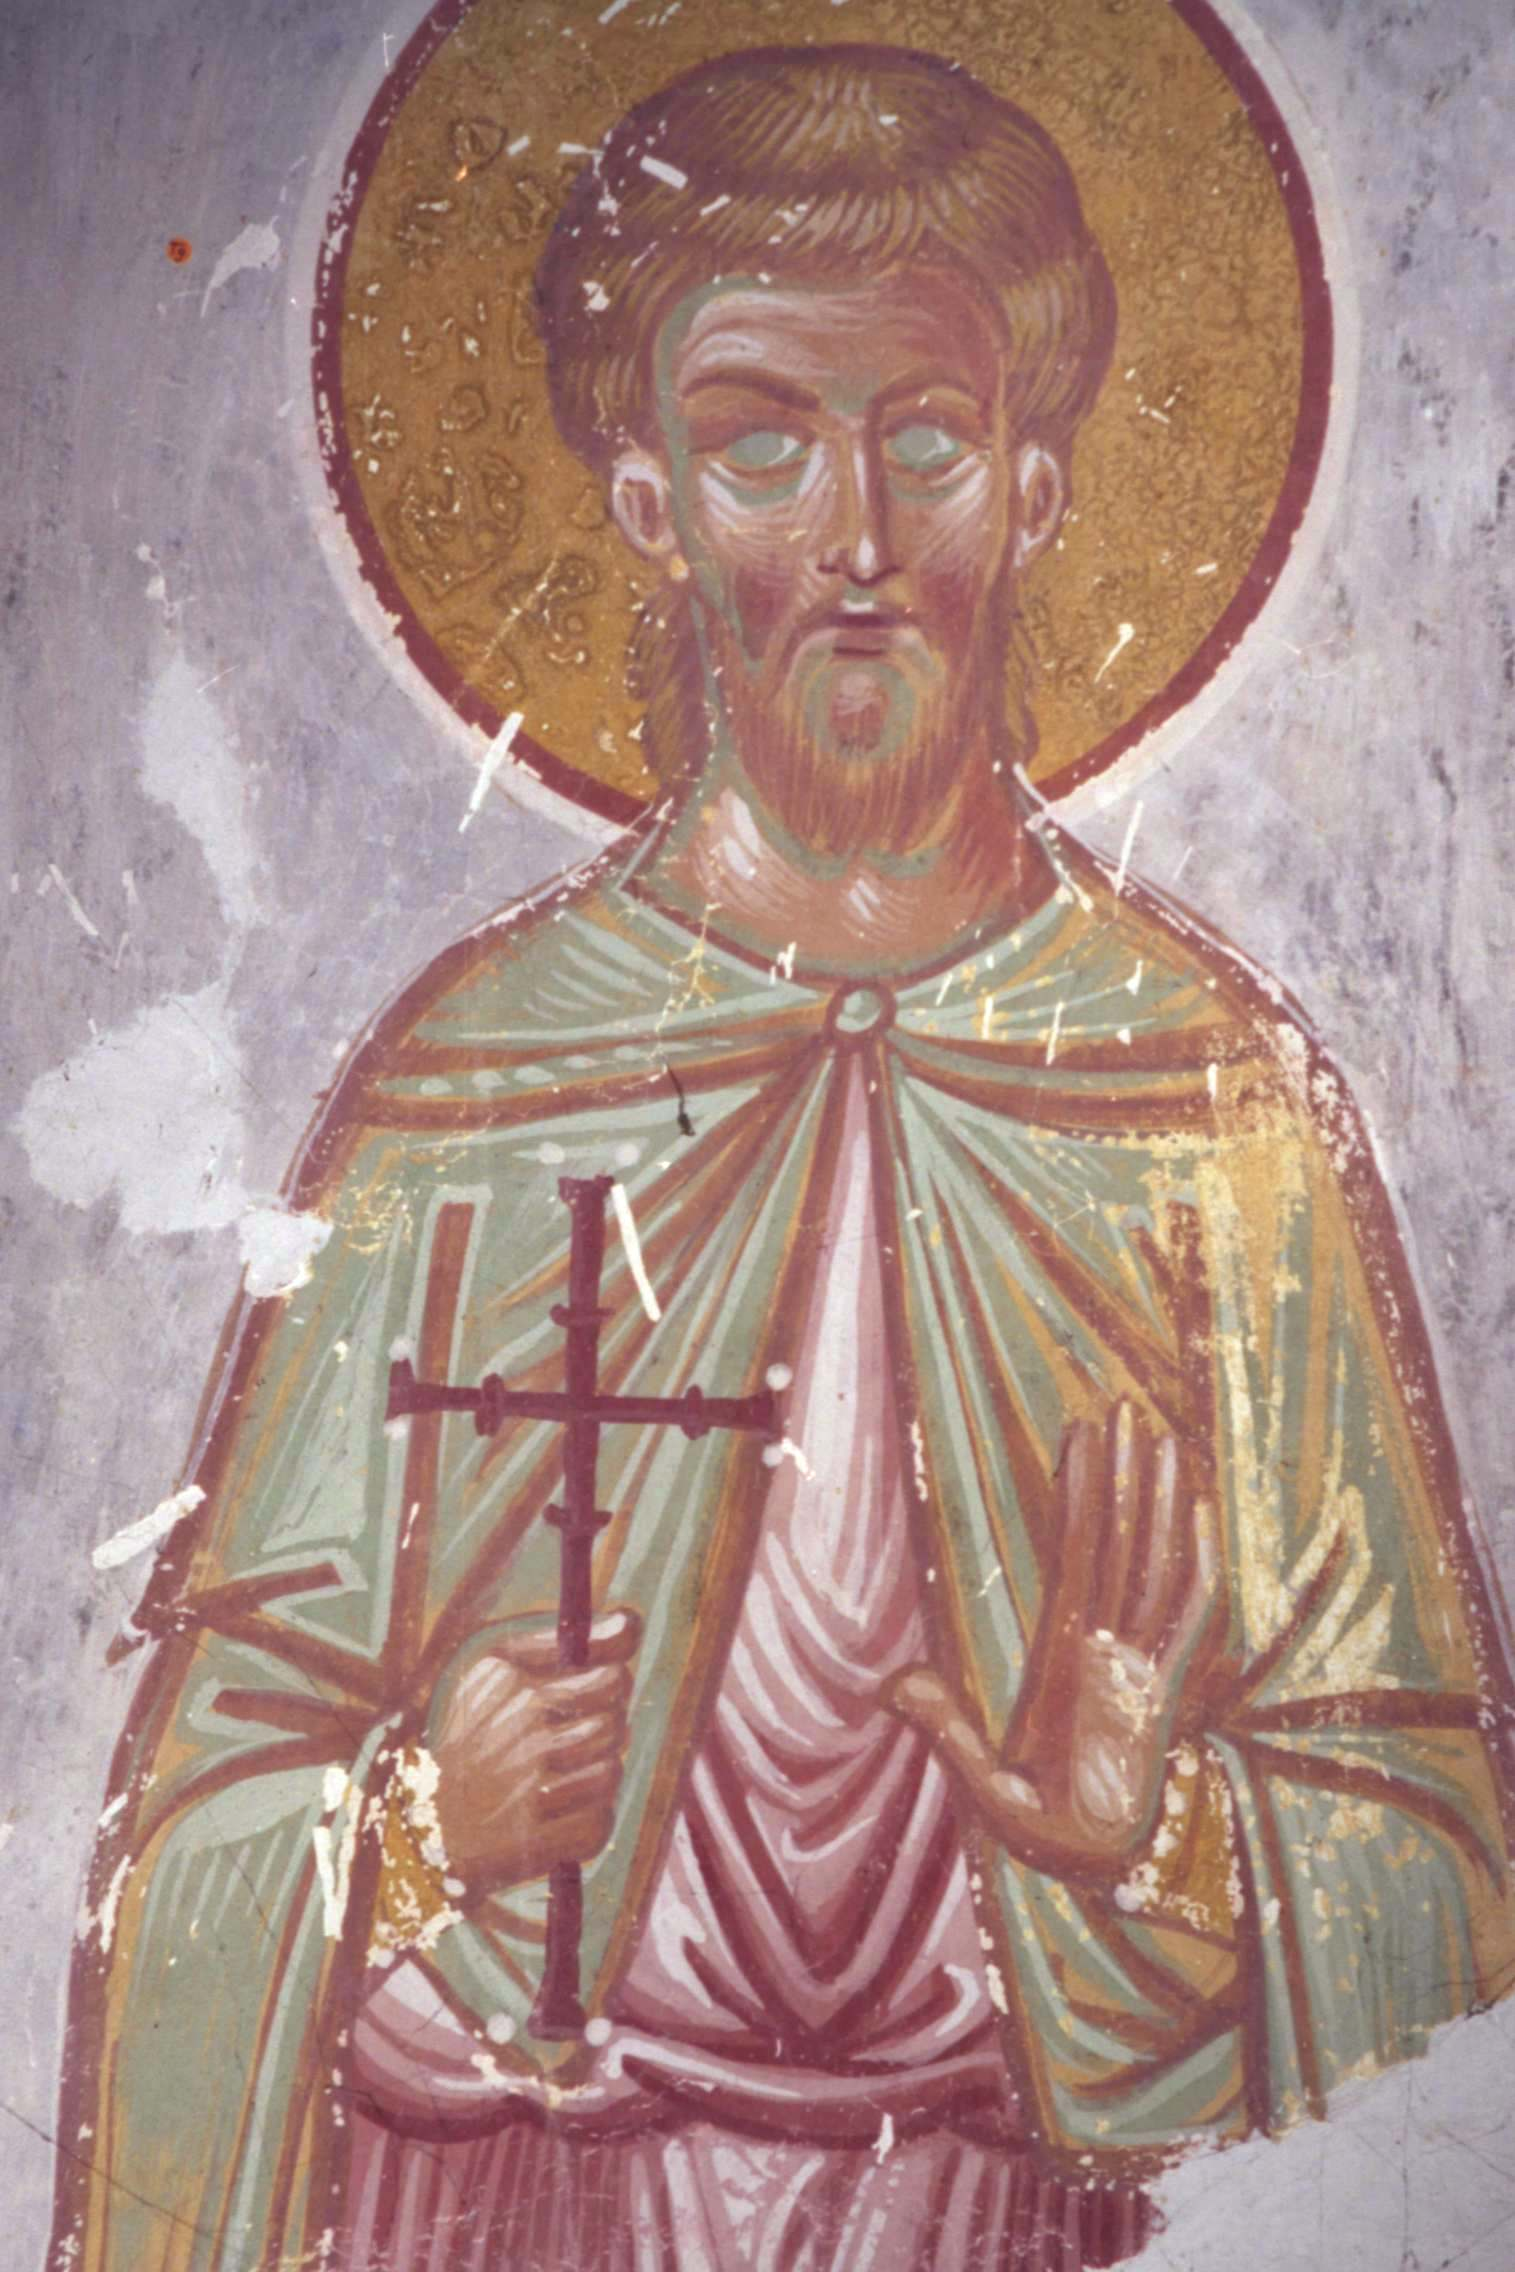 Святой Мина. Фреска собора Христа Спасителя в Цаленджихе, Грузия. XIV век. Фрагмент.